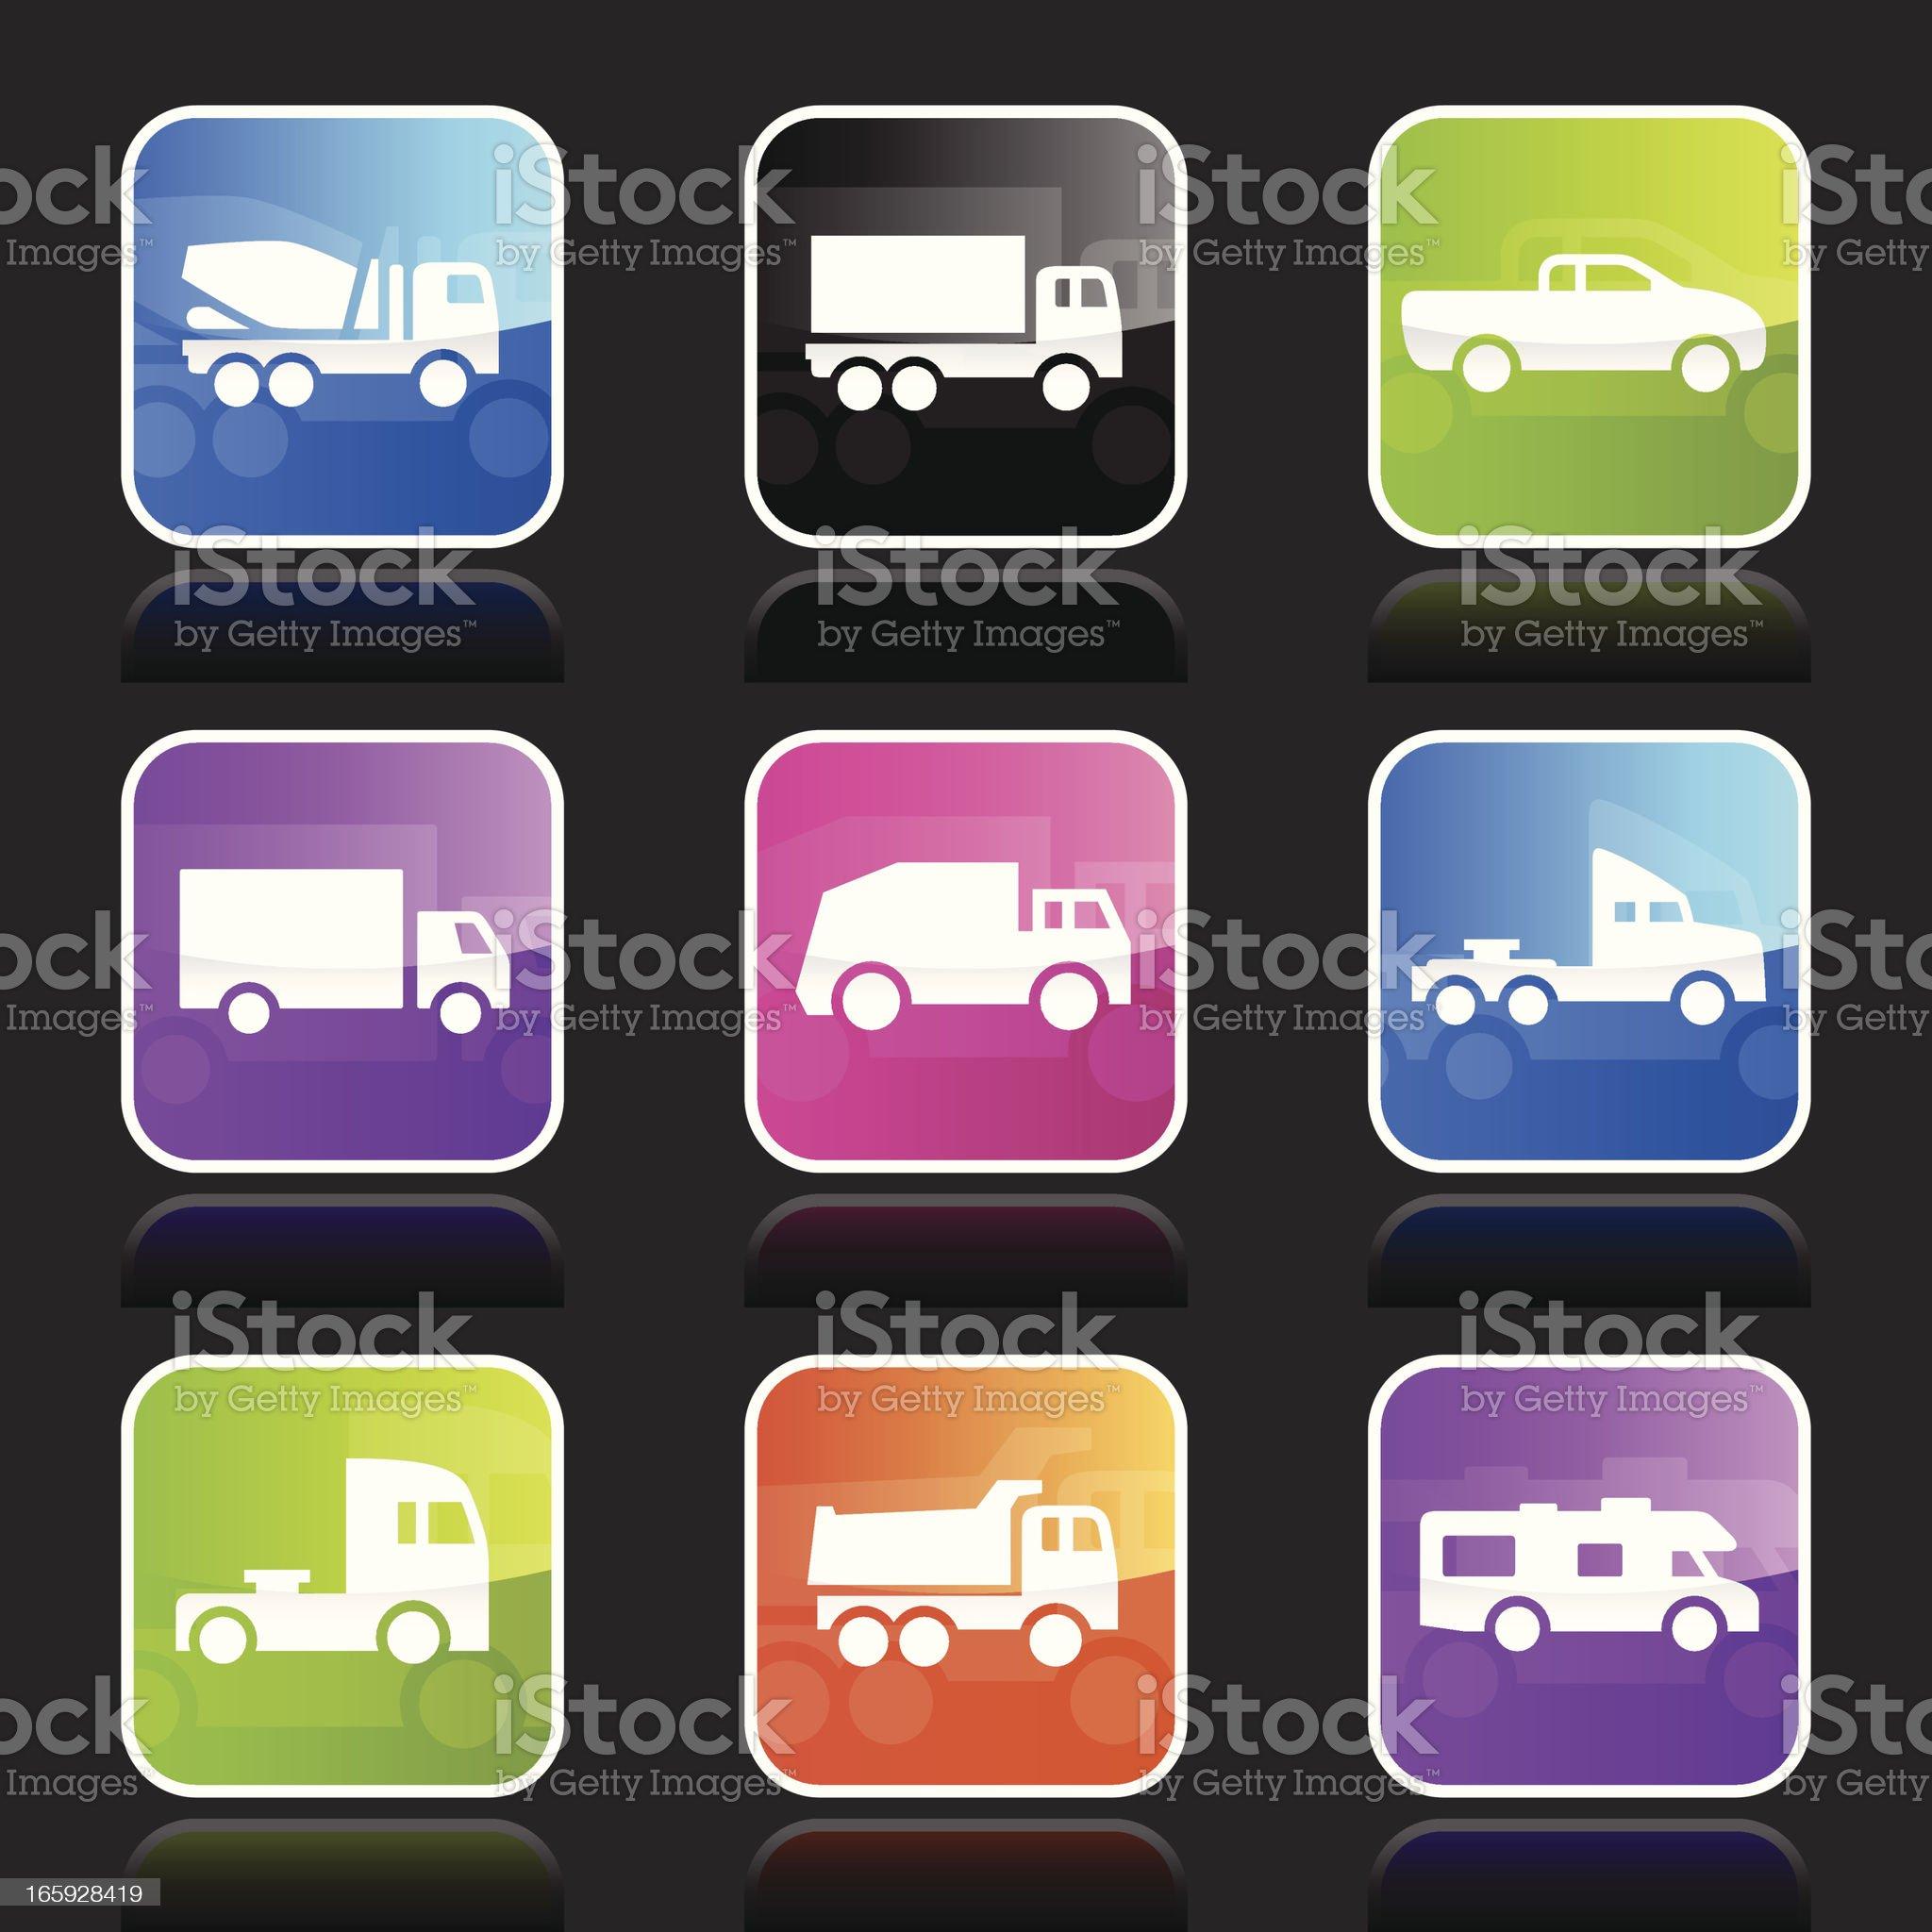 Ubergloss Icons - Trucks royalty-free stock vector art